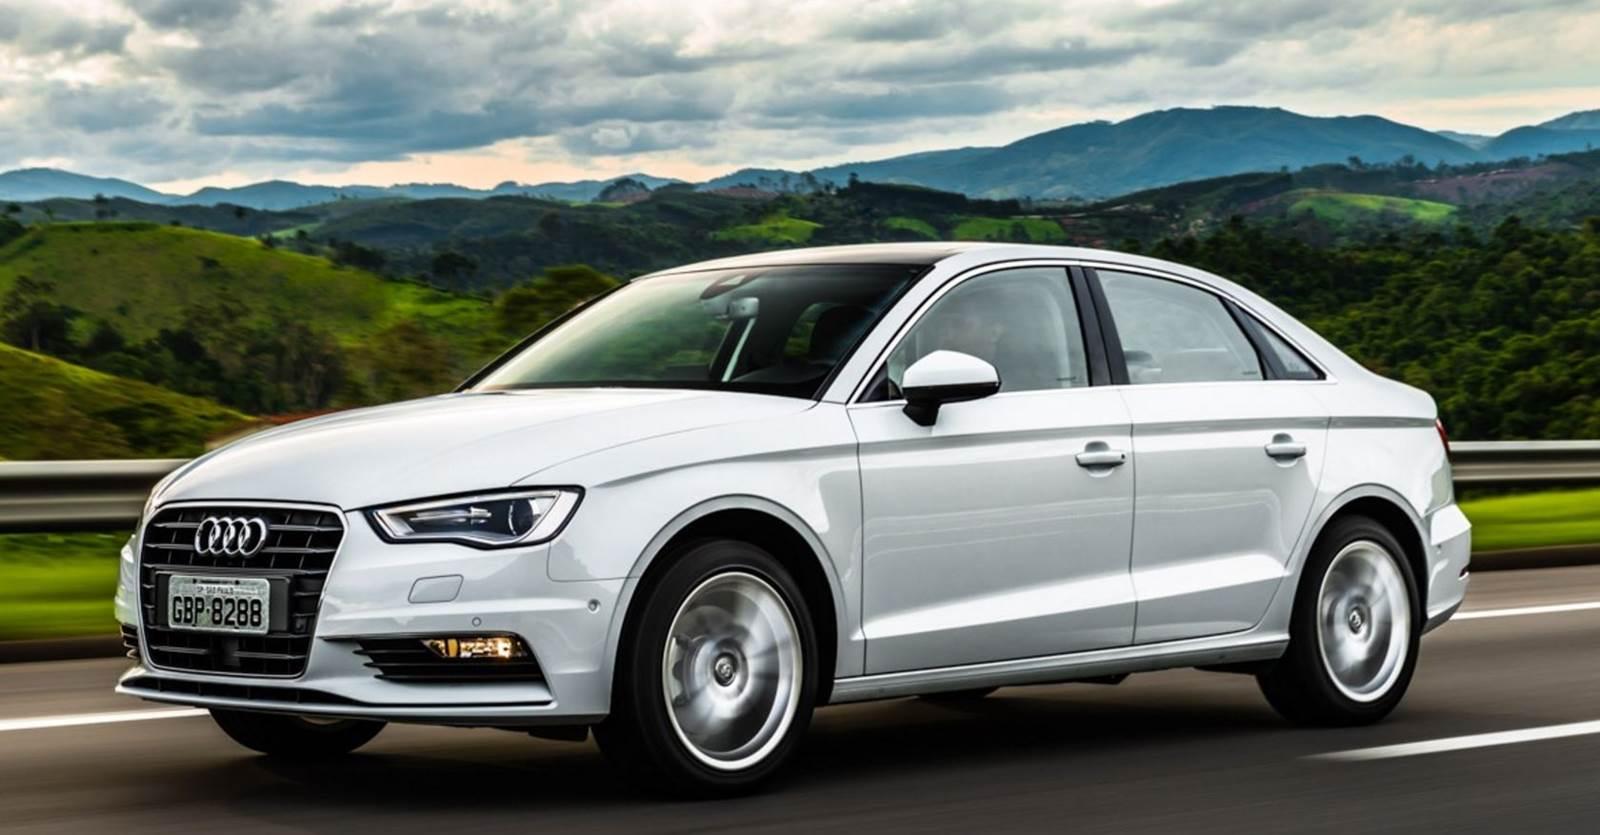 Signo Câncer - Audi A3 2.0 Ambition